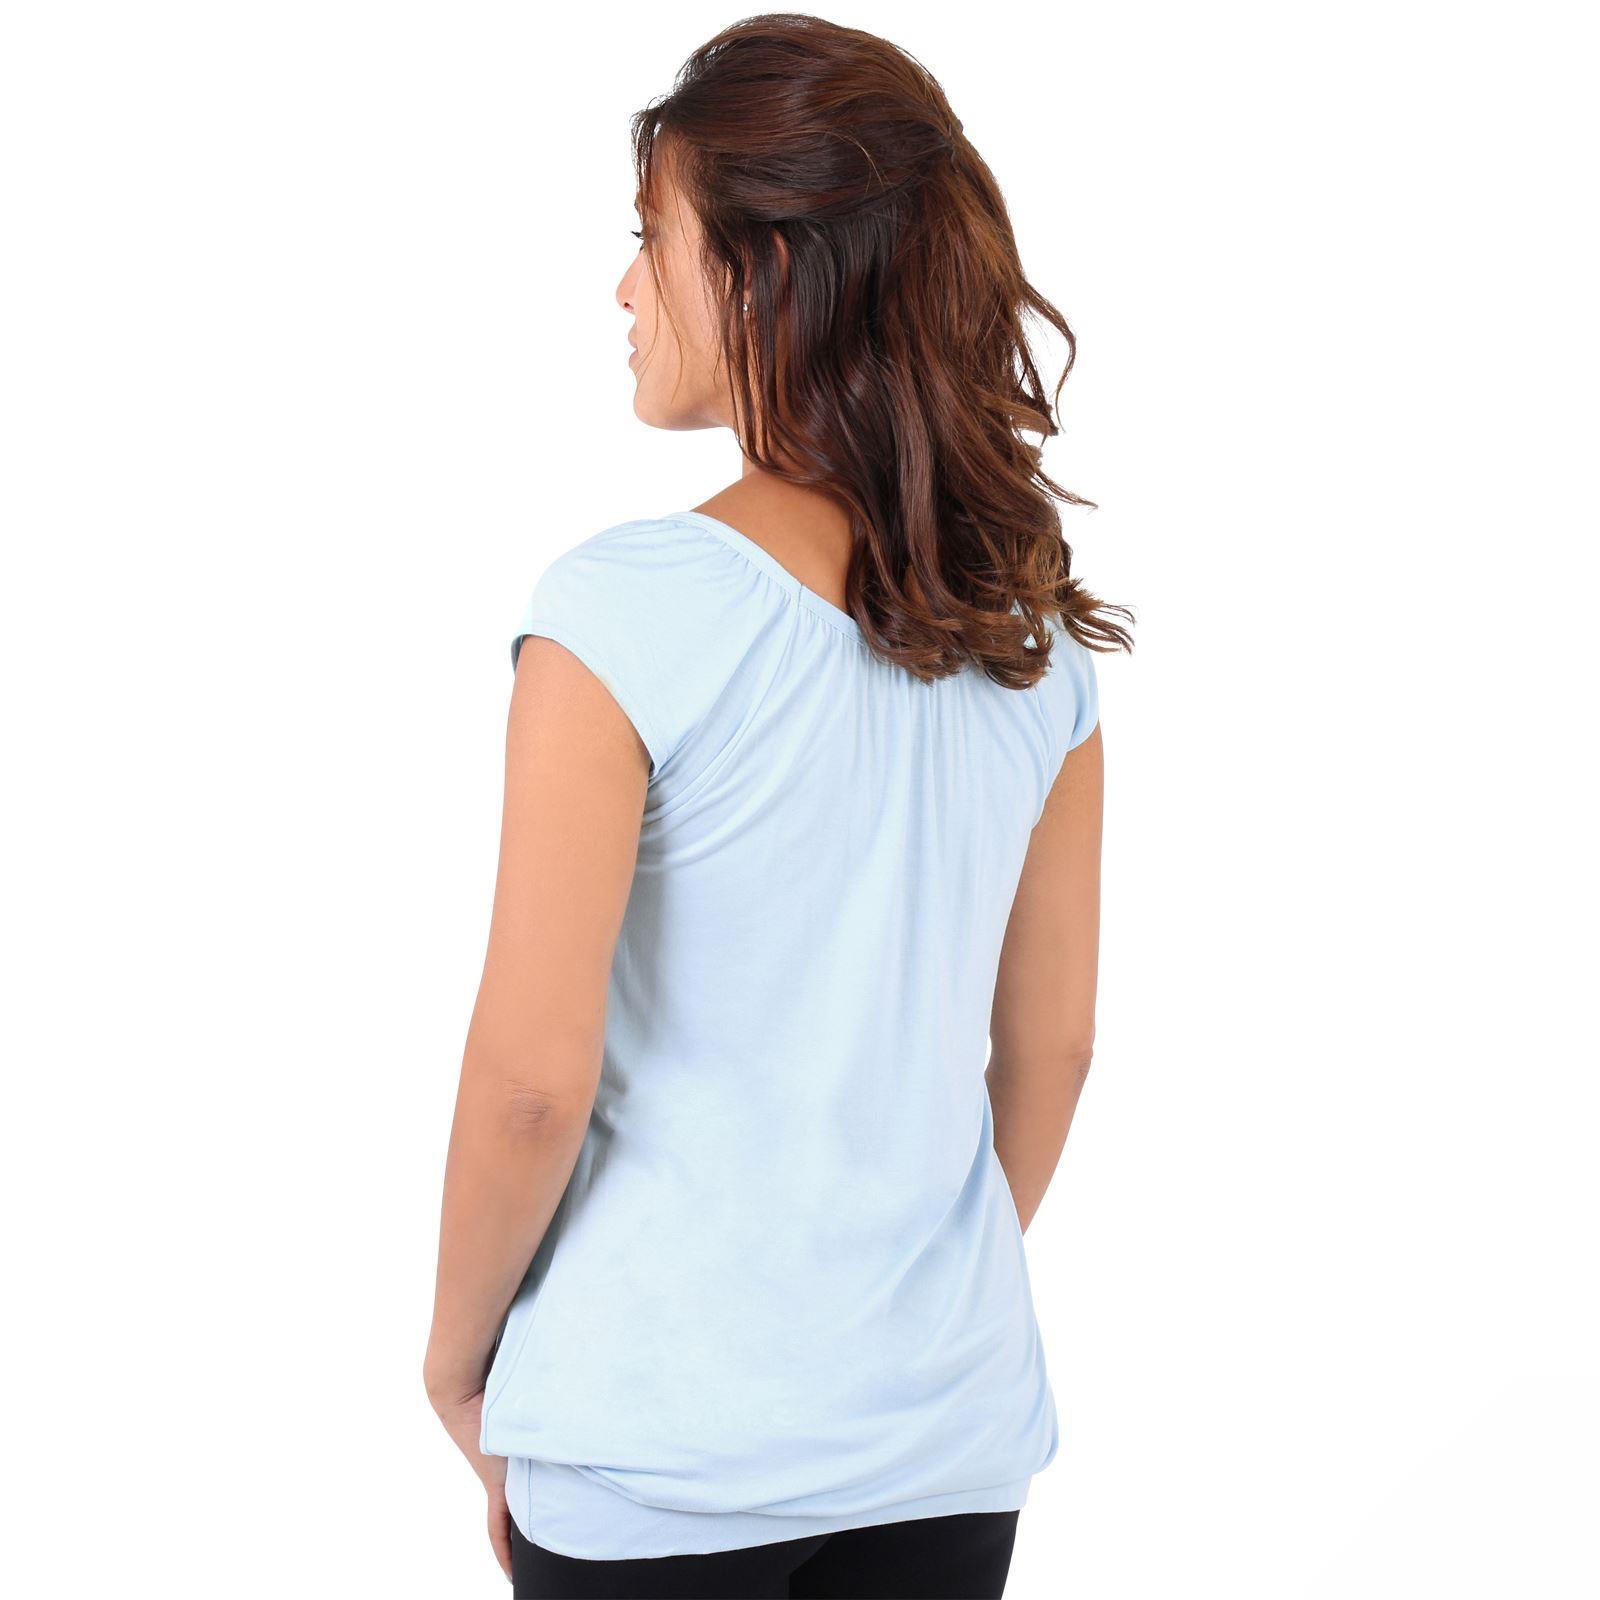 Womens-Ladies-Scoop-Neck-Blouse-V-T-Shirt-Long-Short-Sleeve-Plain-Loose-Top thumbnail 5